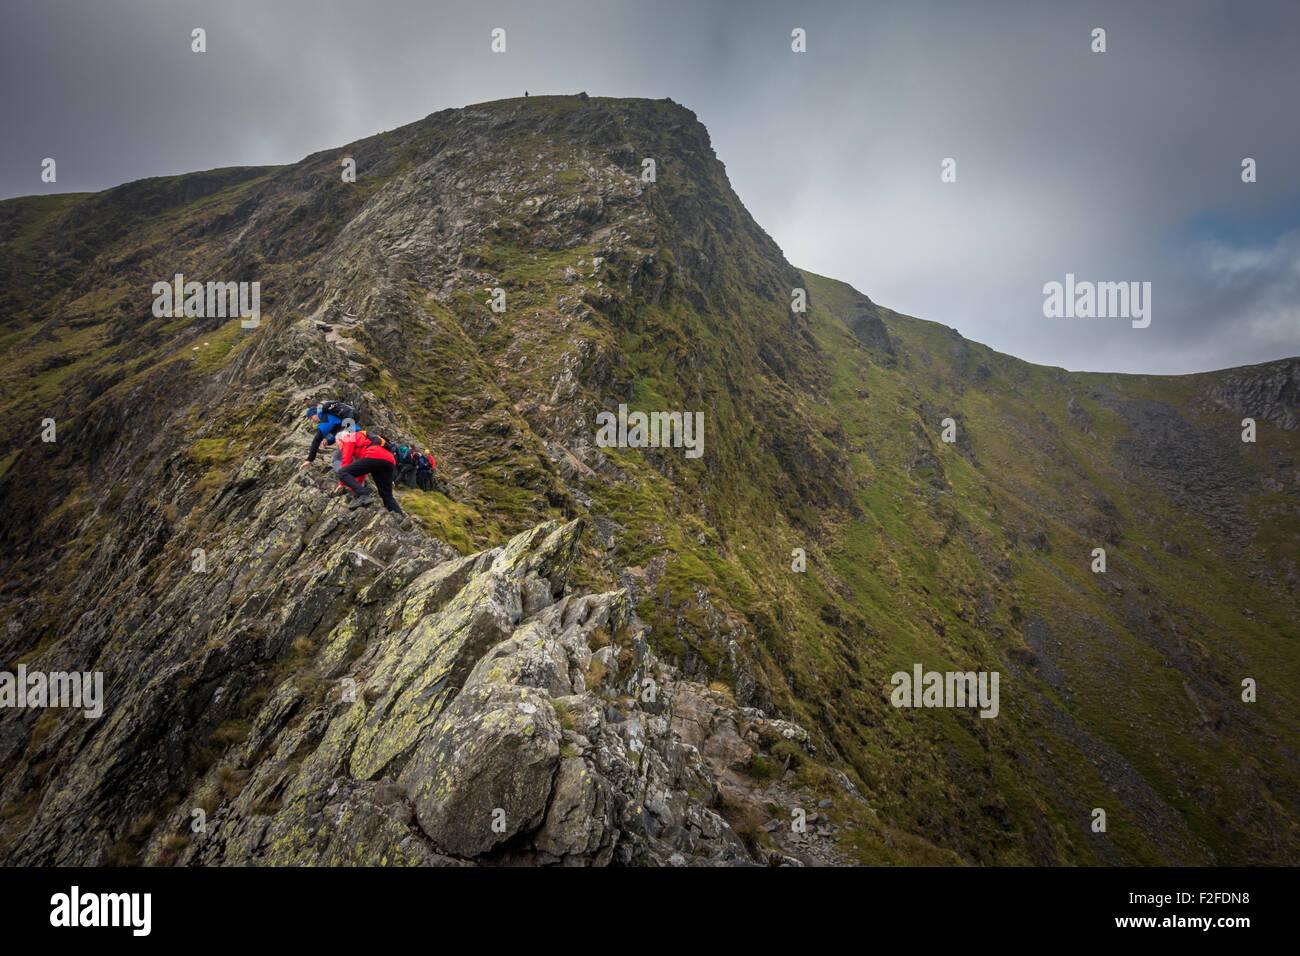 Men socialising - People scrambling up Sharp Edge, a Grade 1 scramble to reach the summit of Blencathra mountain Stock Photo